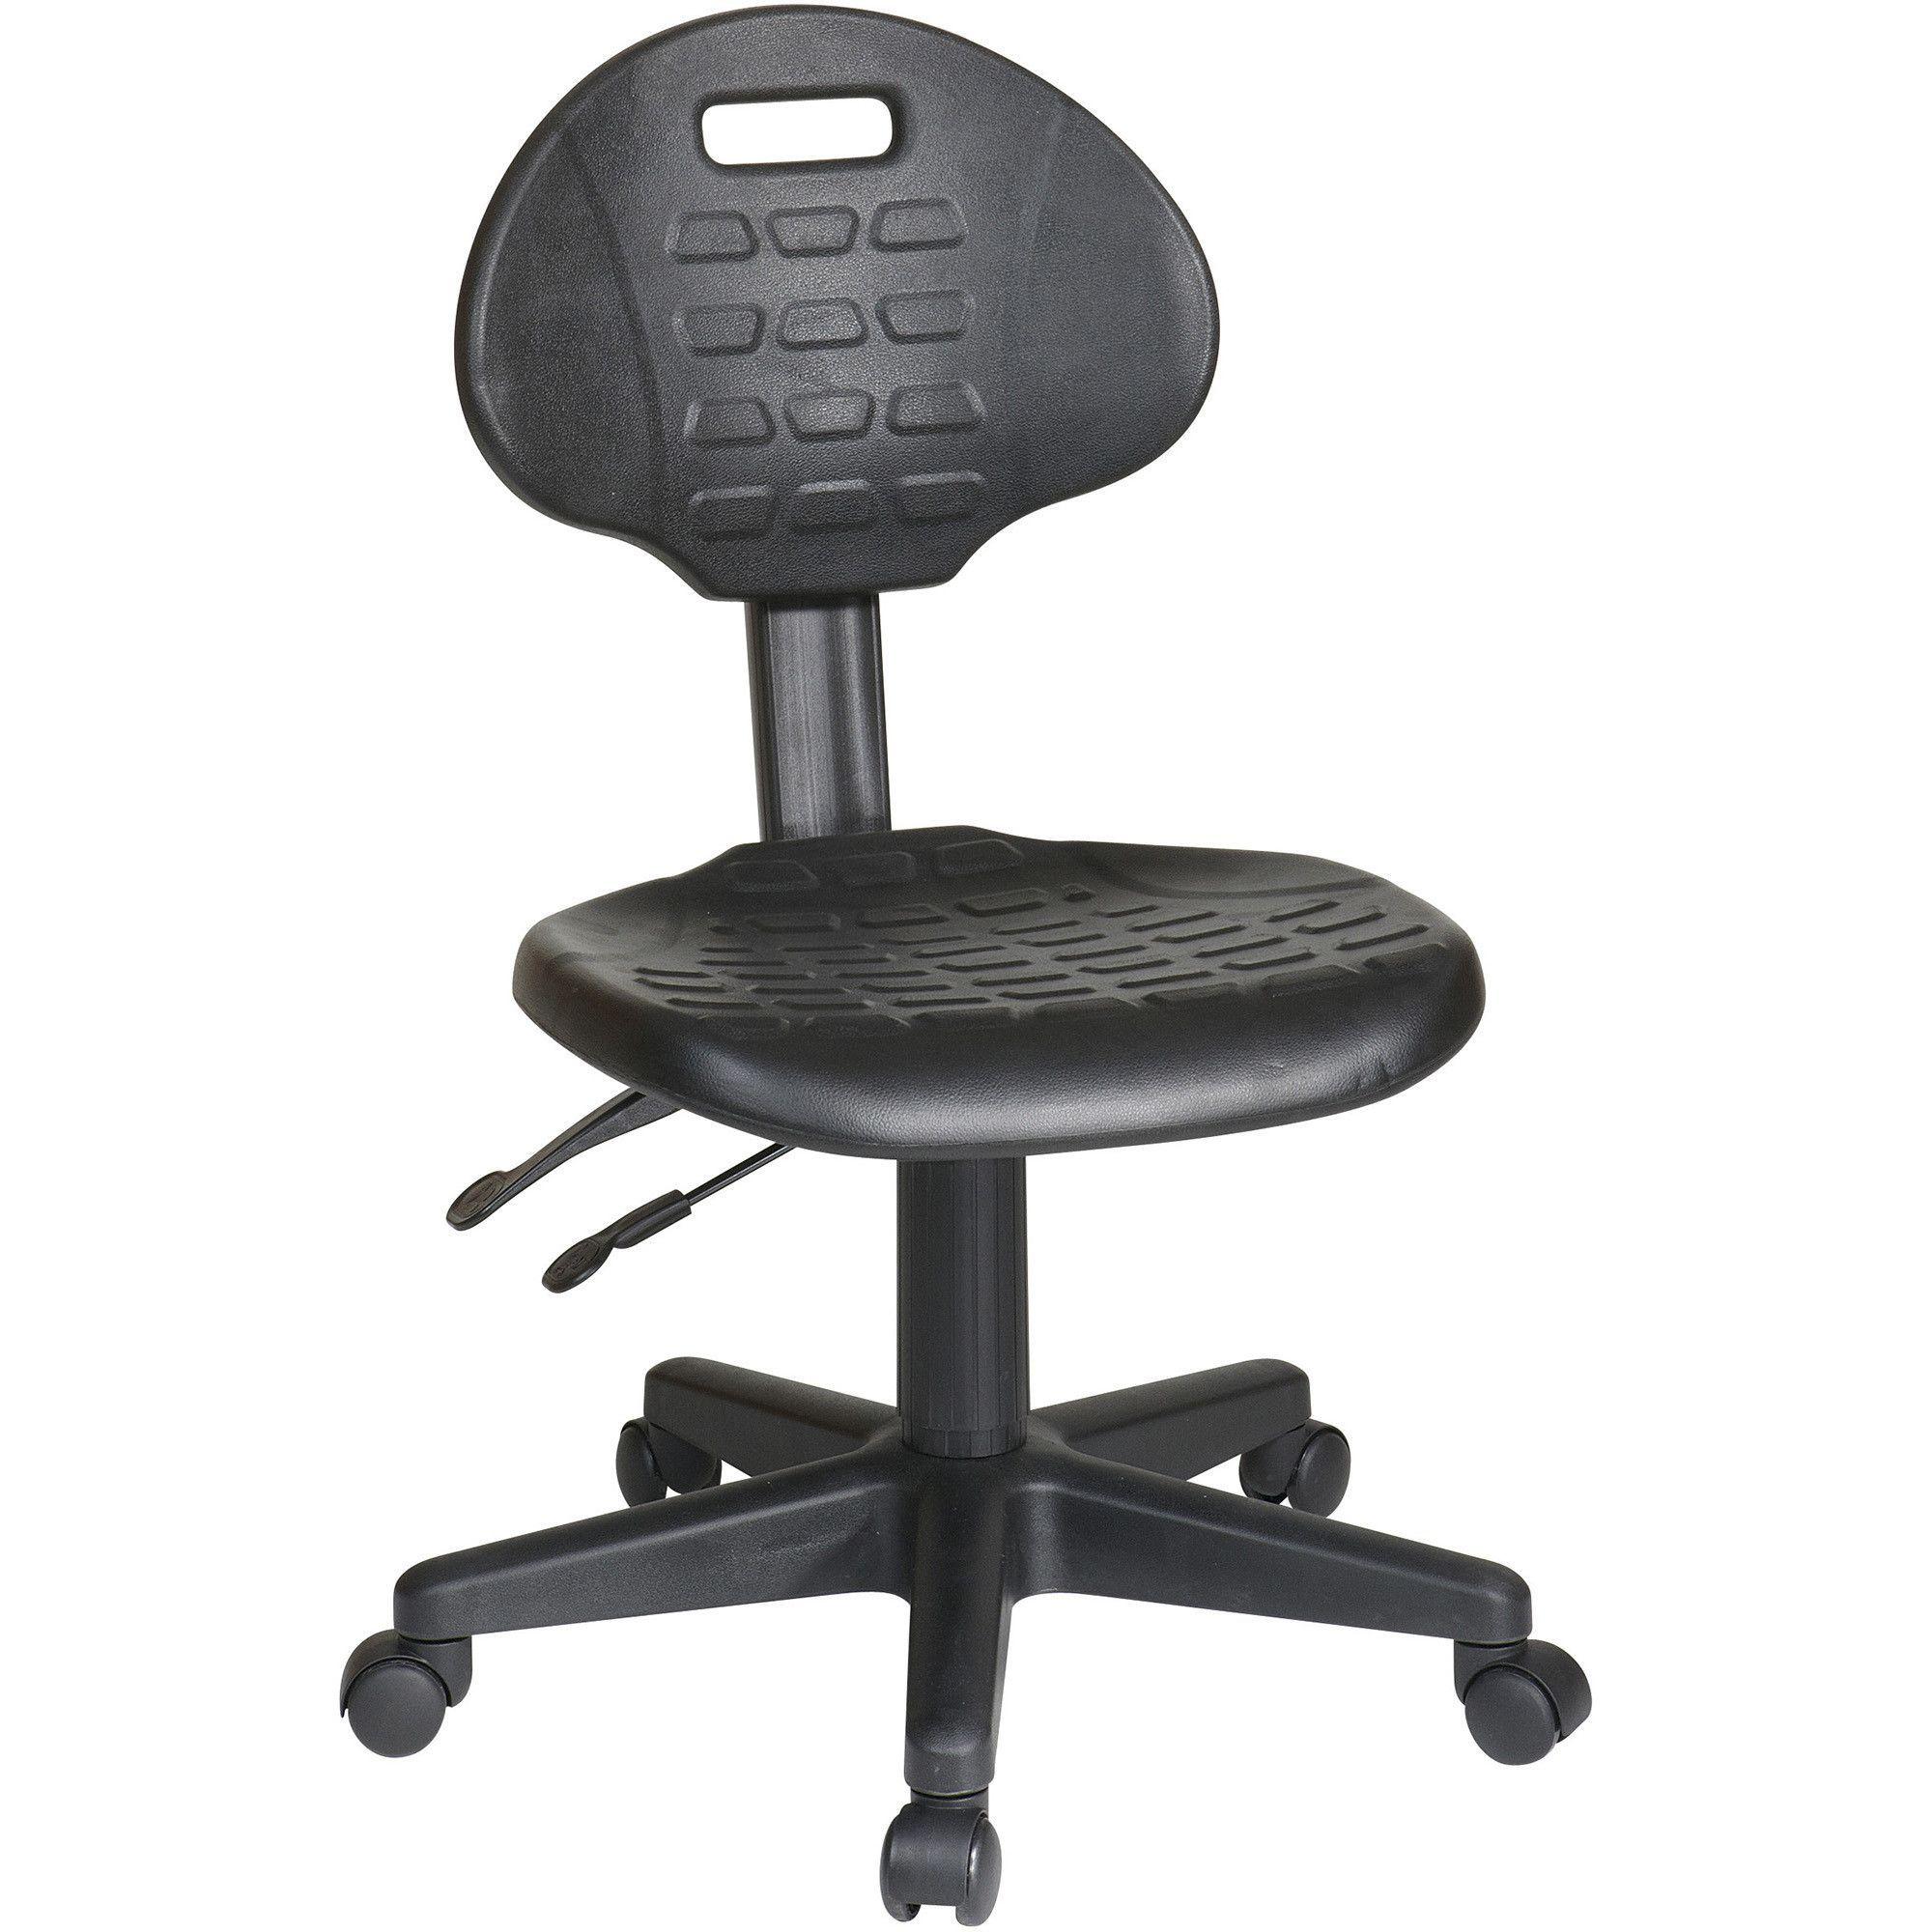 ergonomic chair angle desk piston work smart knob hill with seat tilt